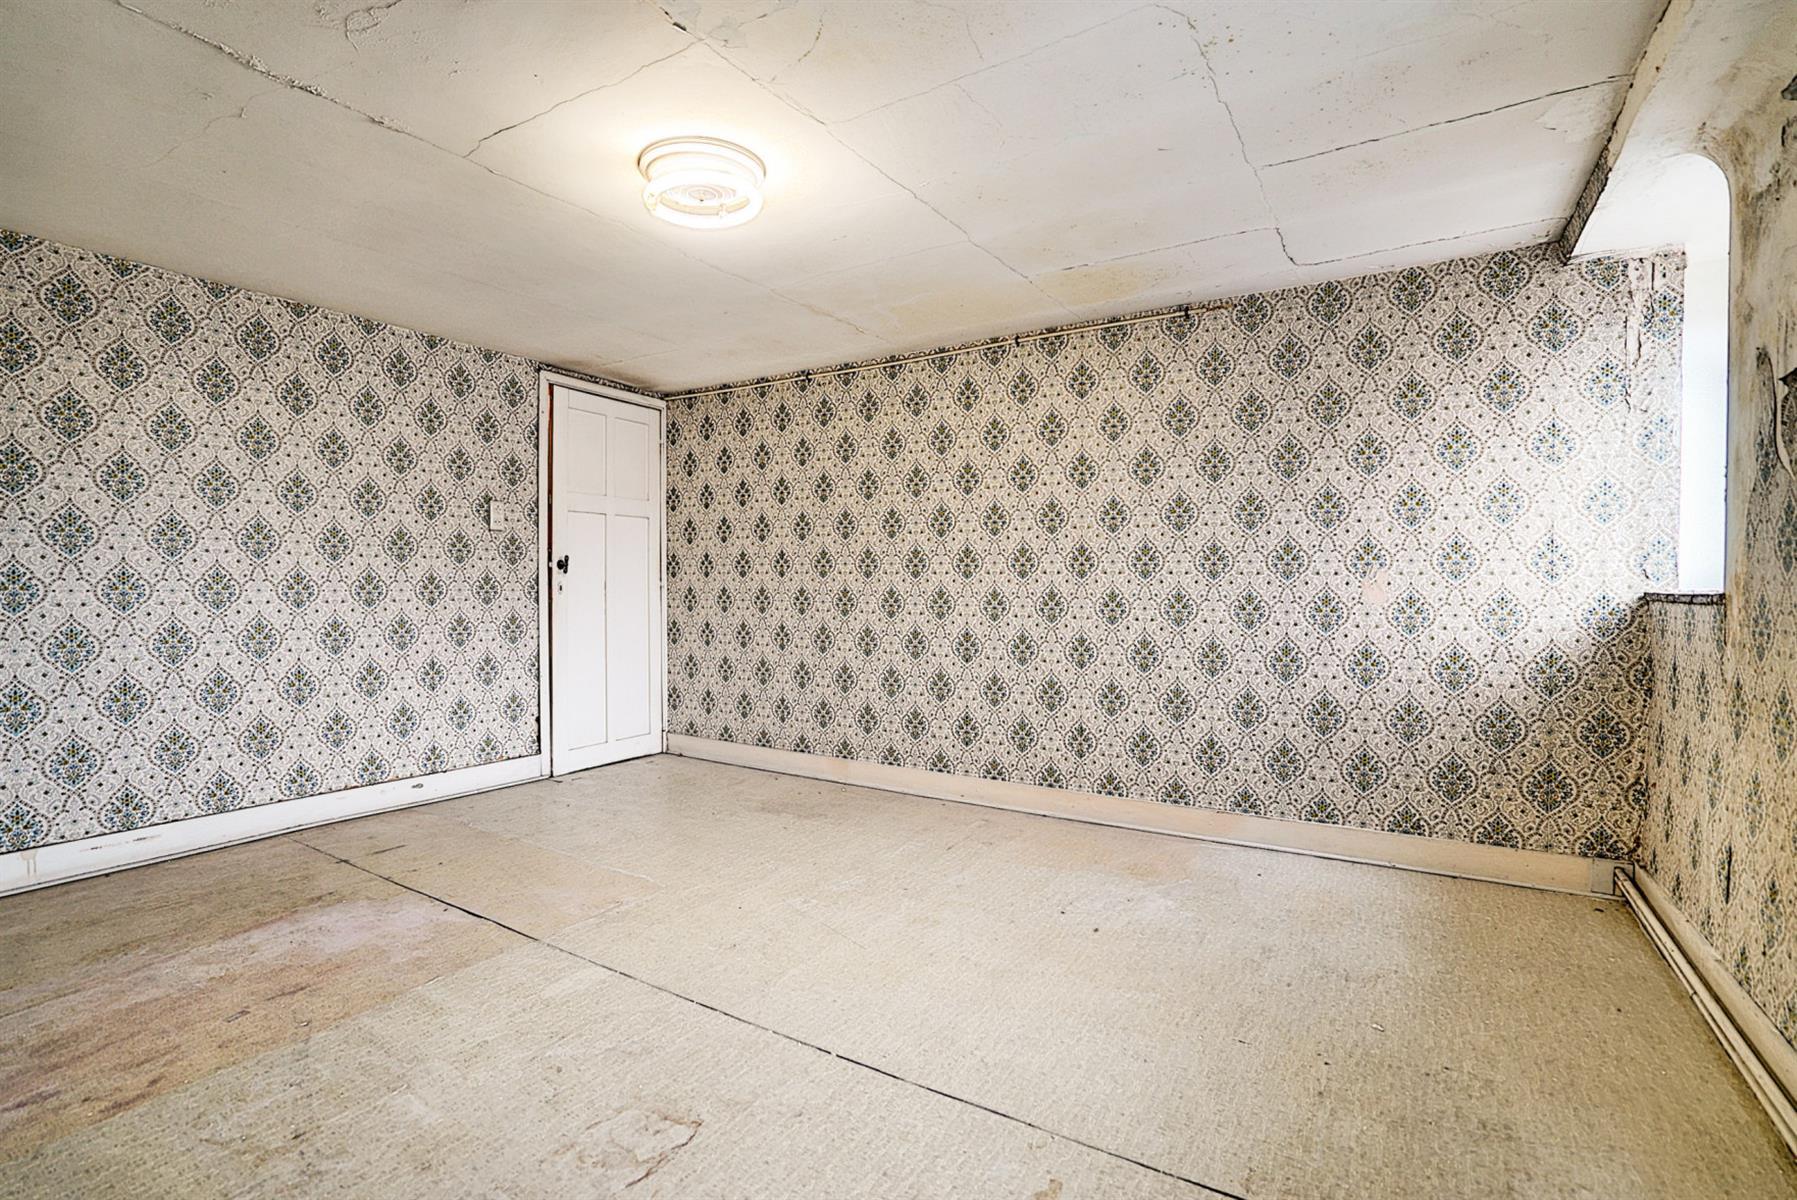 Maison - Ottignies-Louvain-la-Neuve - #4262981-21